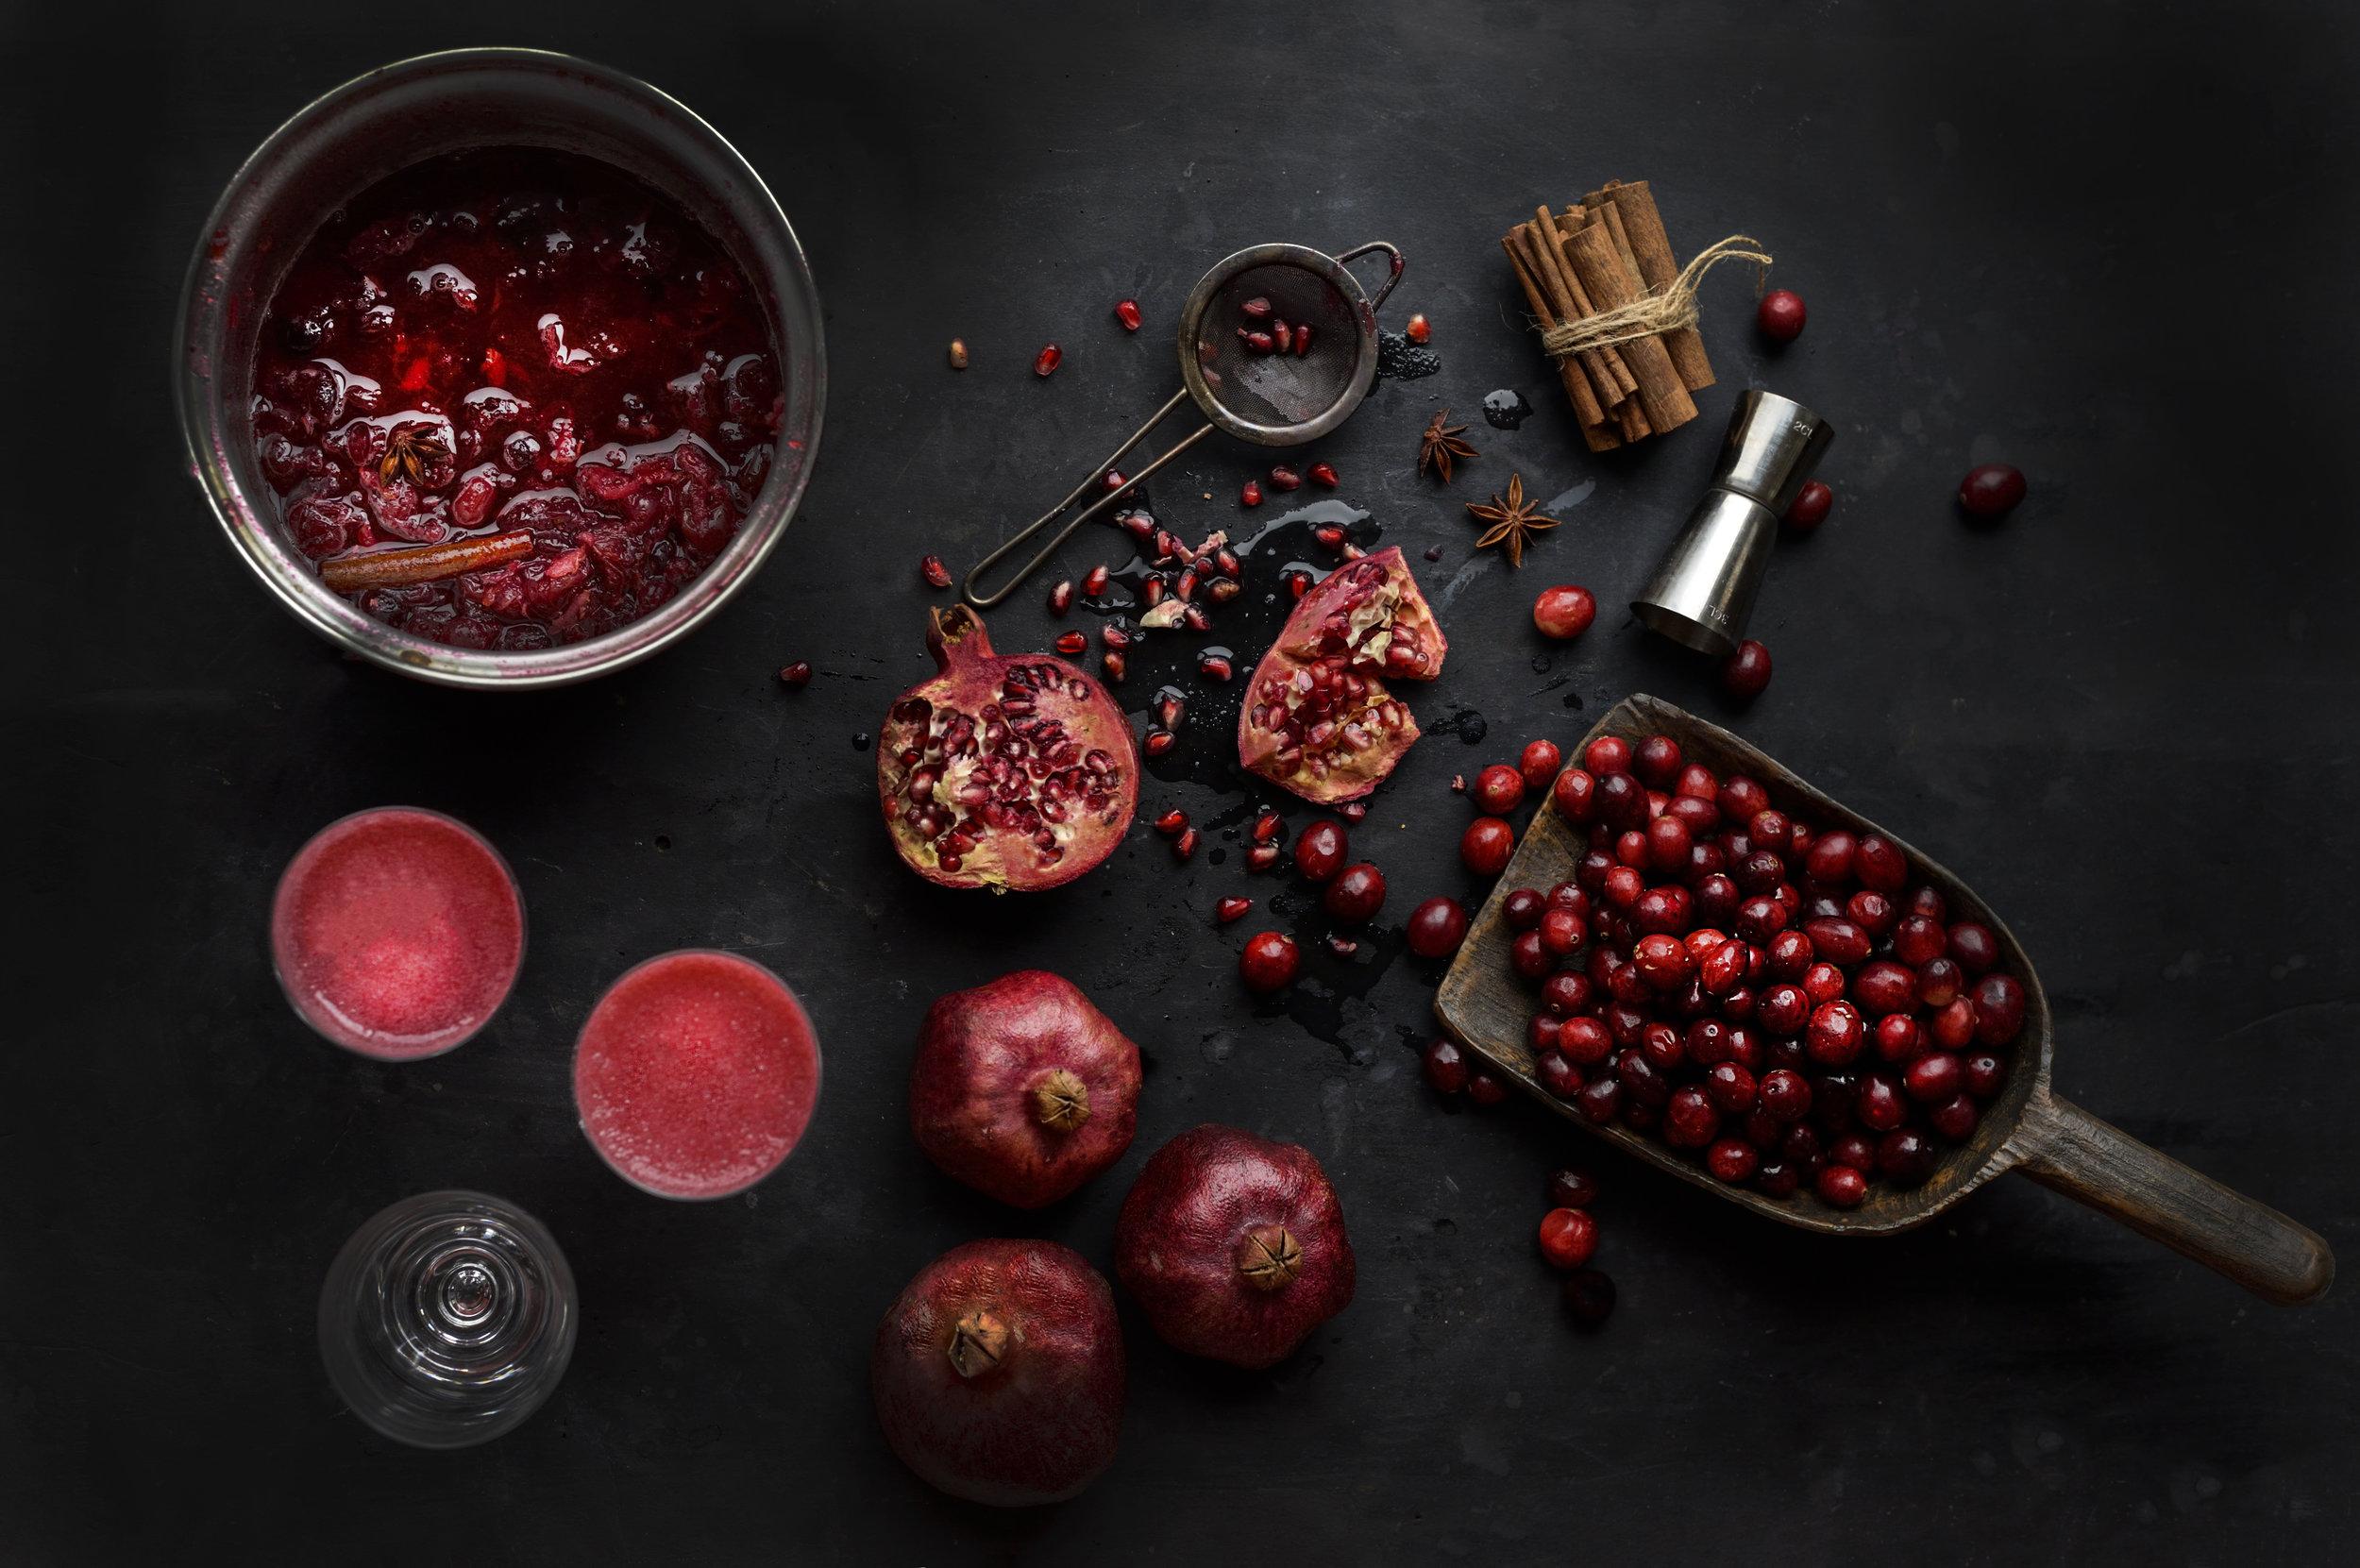 PomegranateCranberryGin-HR-L-SimiJois-2016.jpg